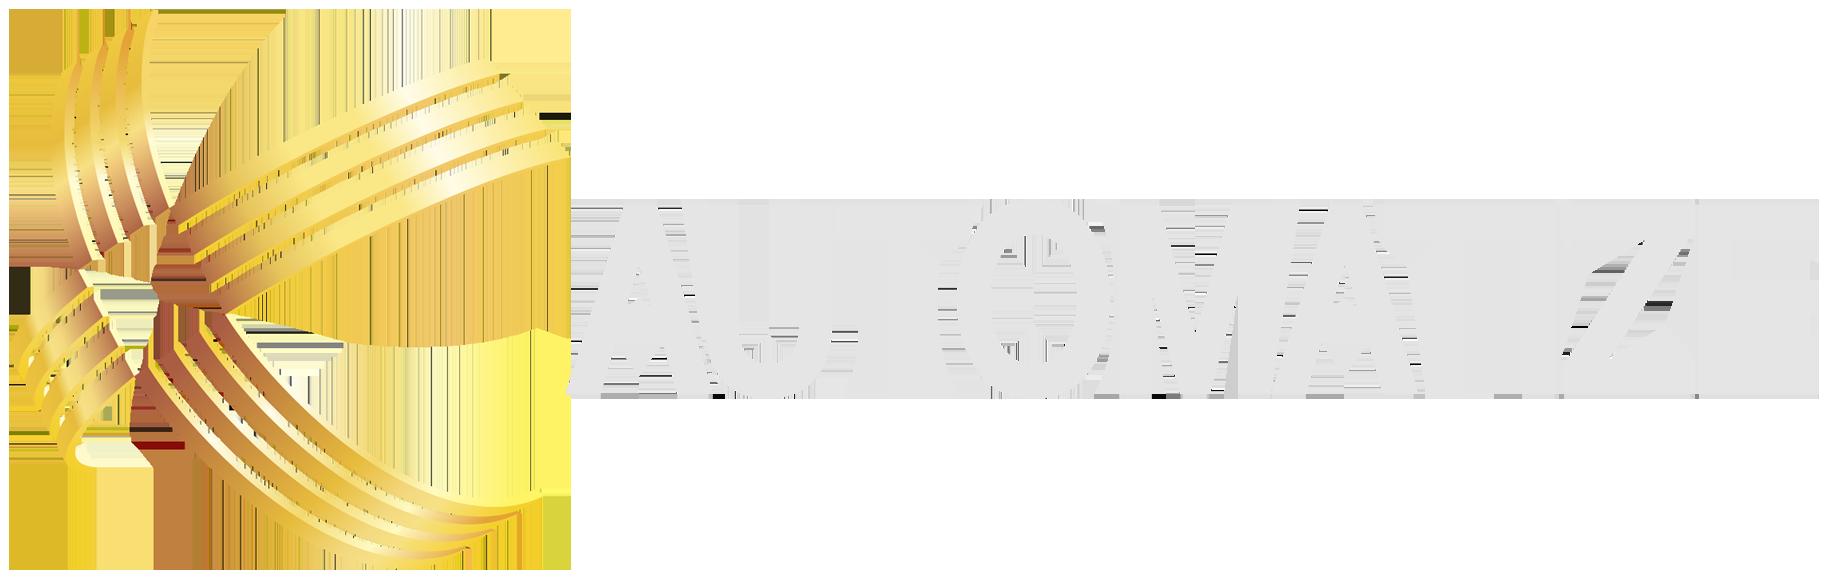 - AUTOMATIZE